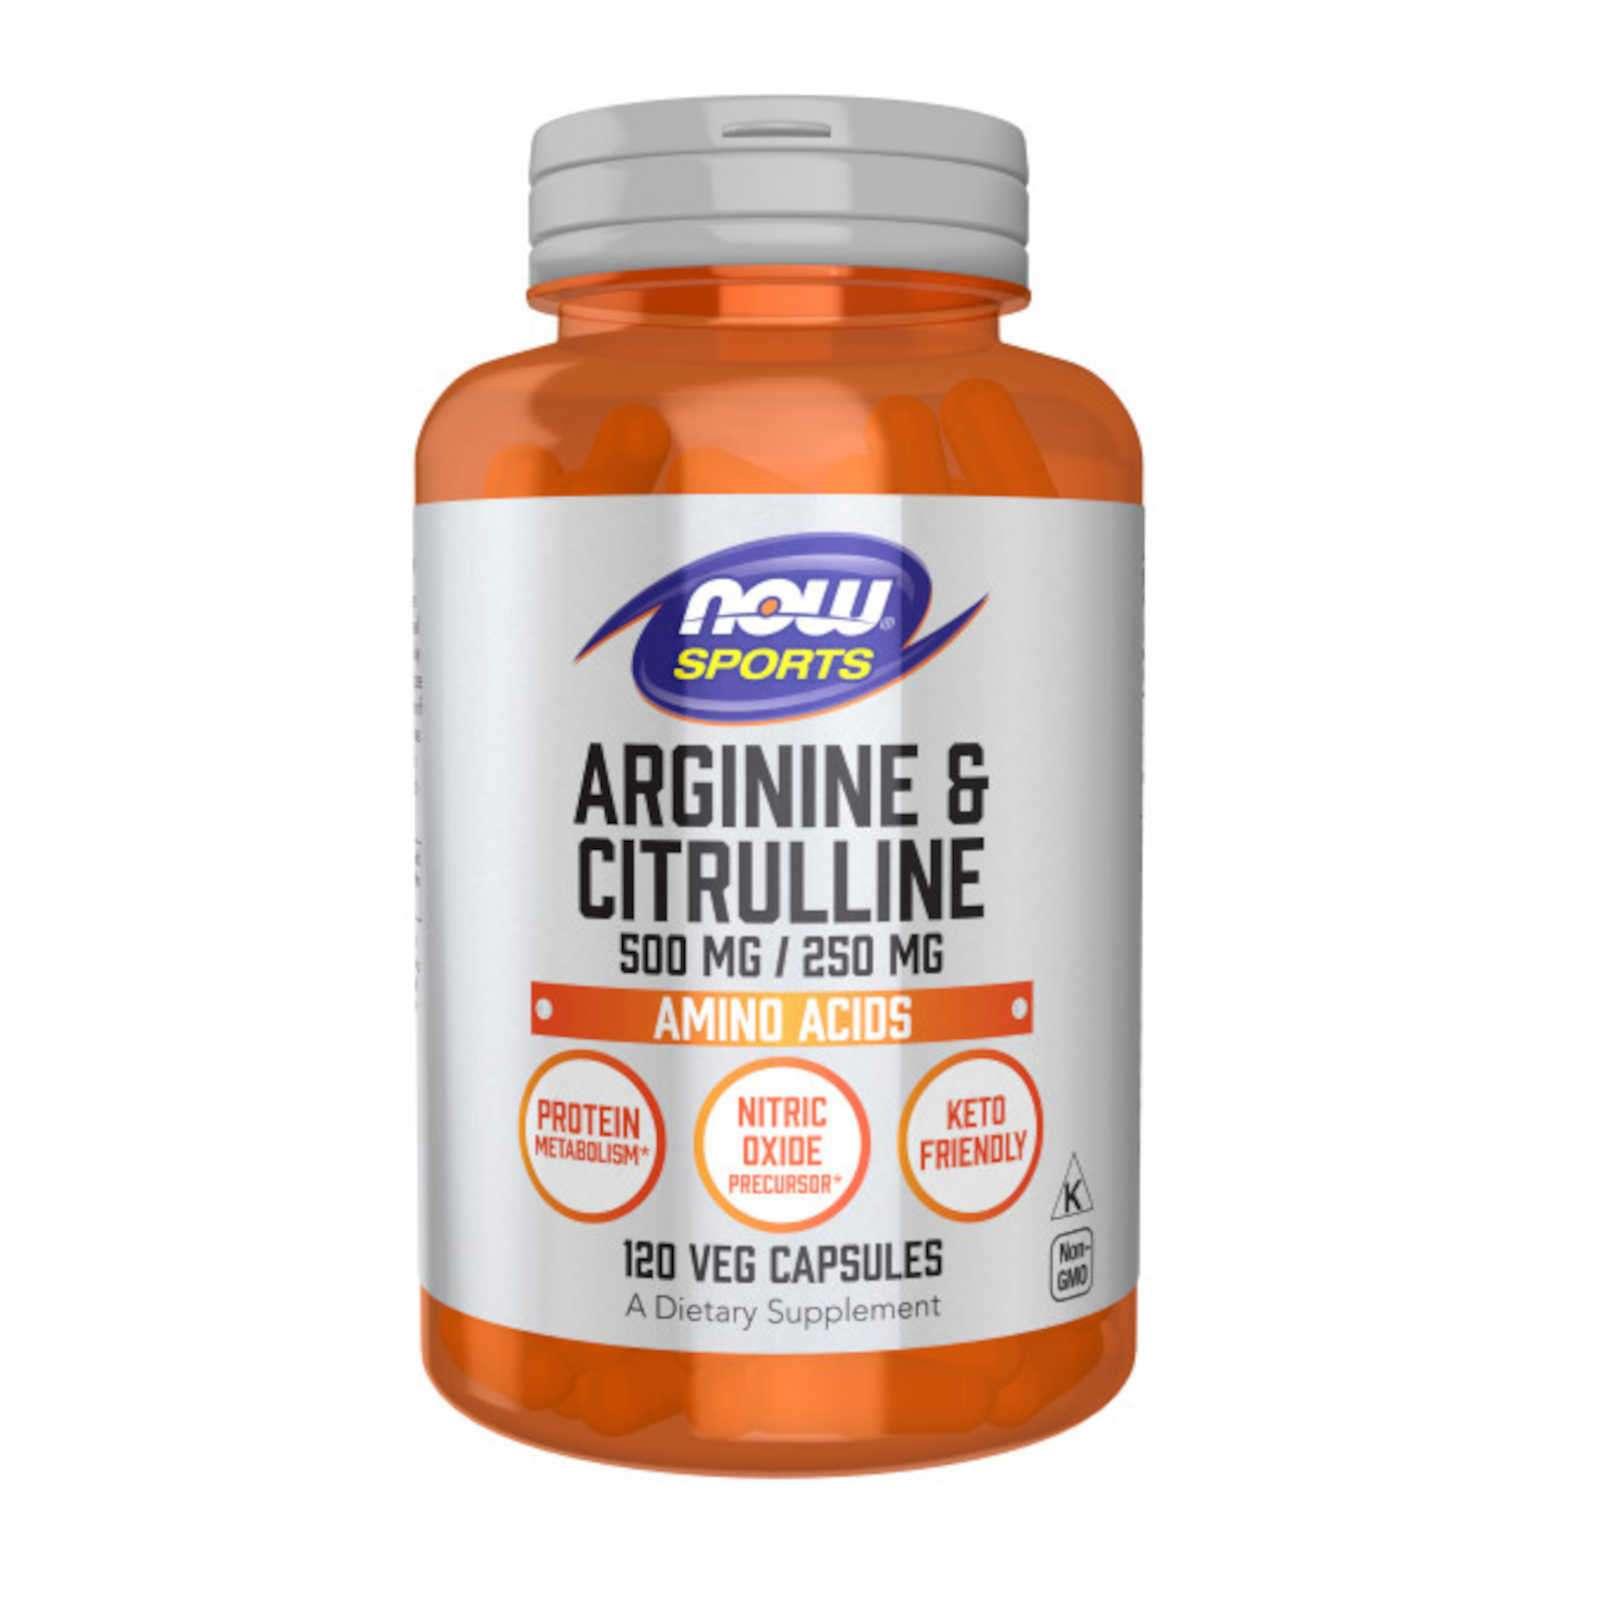 ARGININE & CITRULINE 500mg/250mg - 120 veg caps